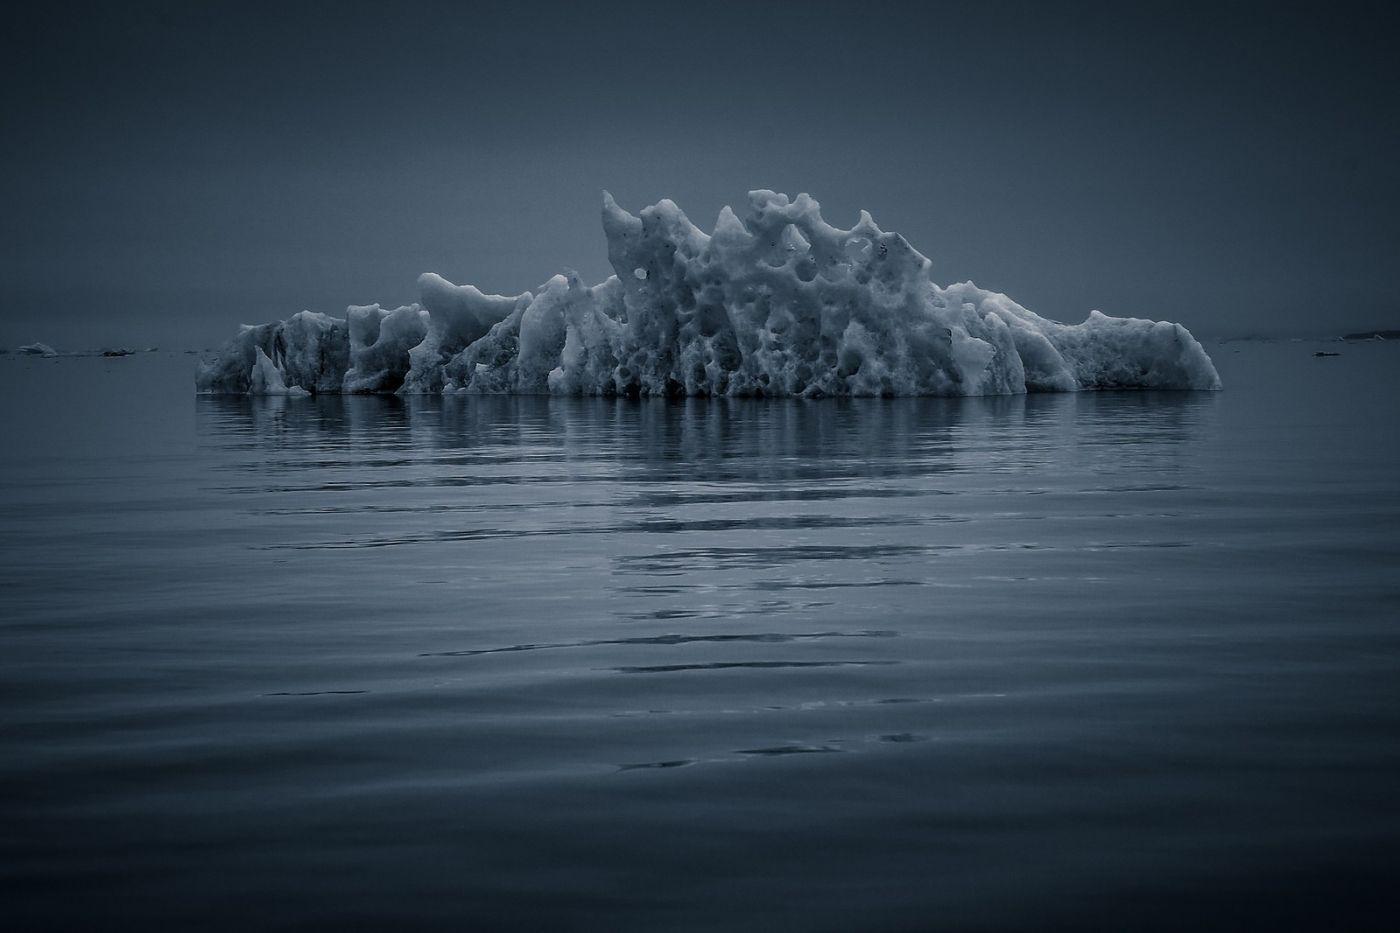 冰岛冰川泻湖(Glacier Lagoon),流动的冰川_图1-31